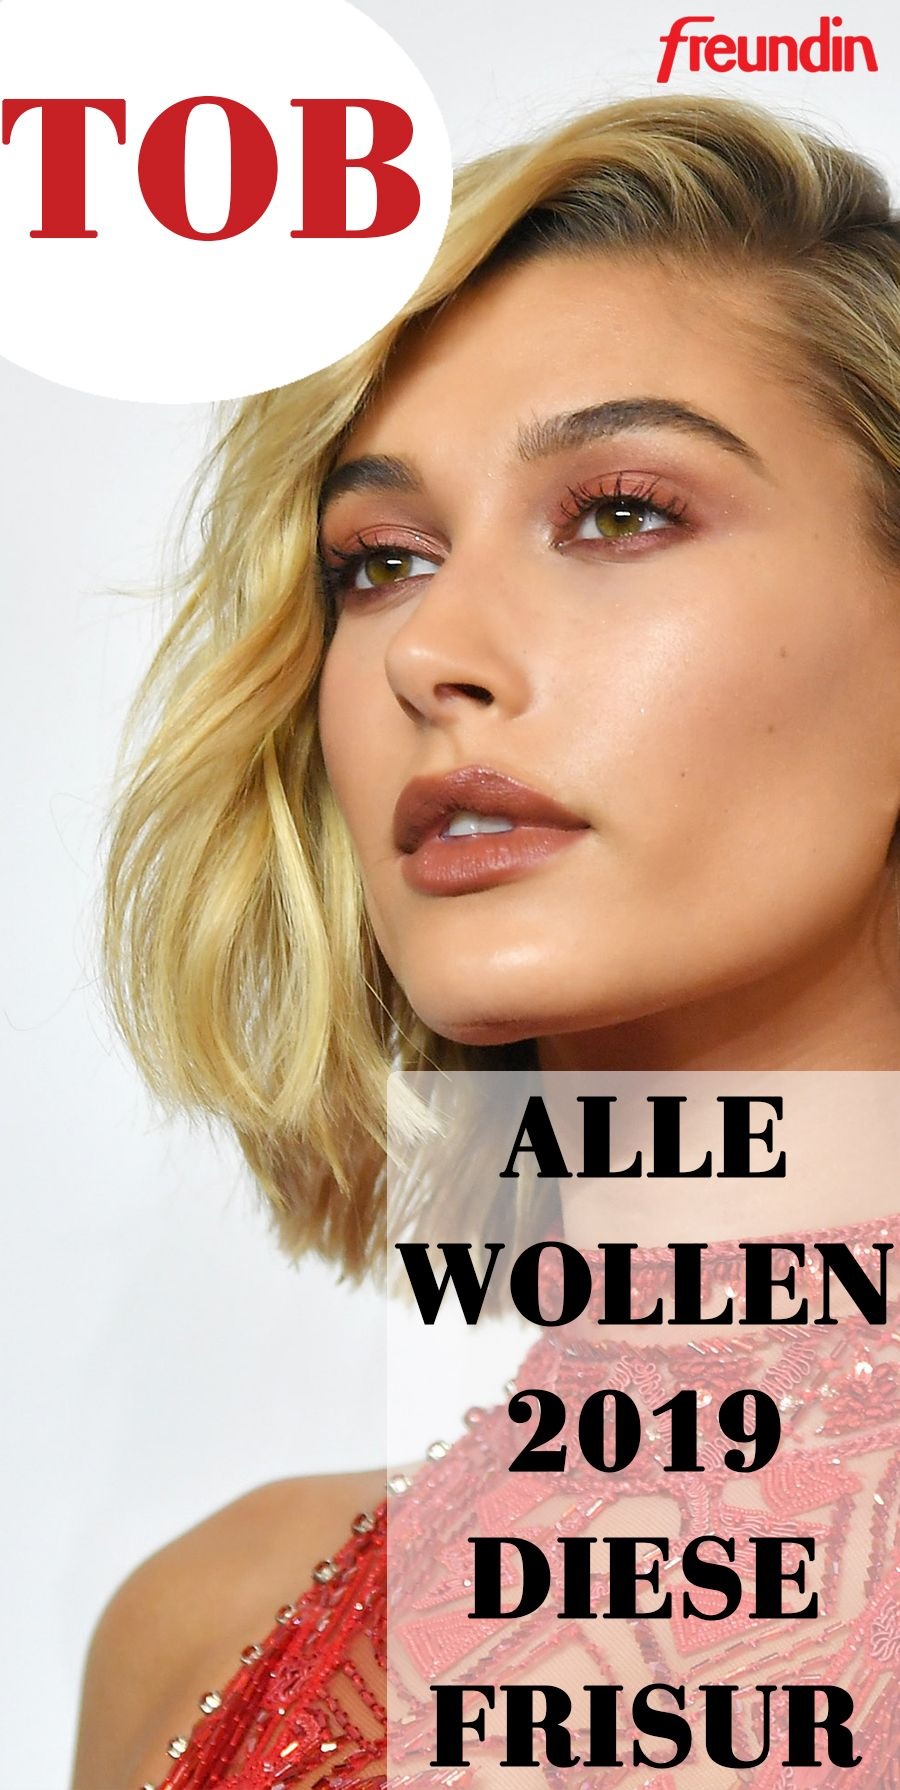 Frisuren Trend 2019 Alle Wollen Den Tob Bob Frisur Gerade Frisuren Frisuren Trend